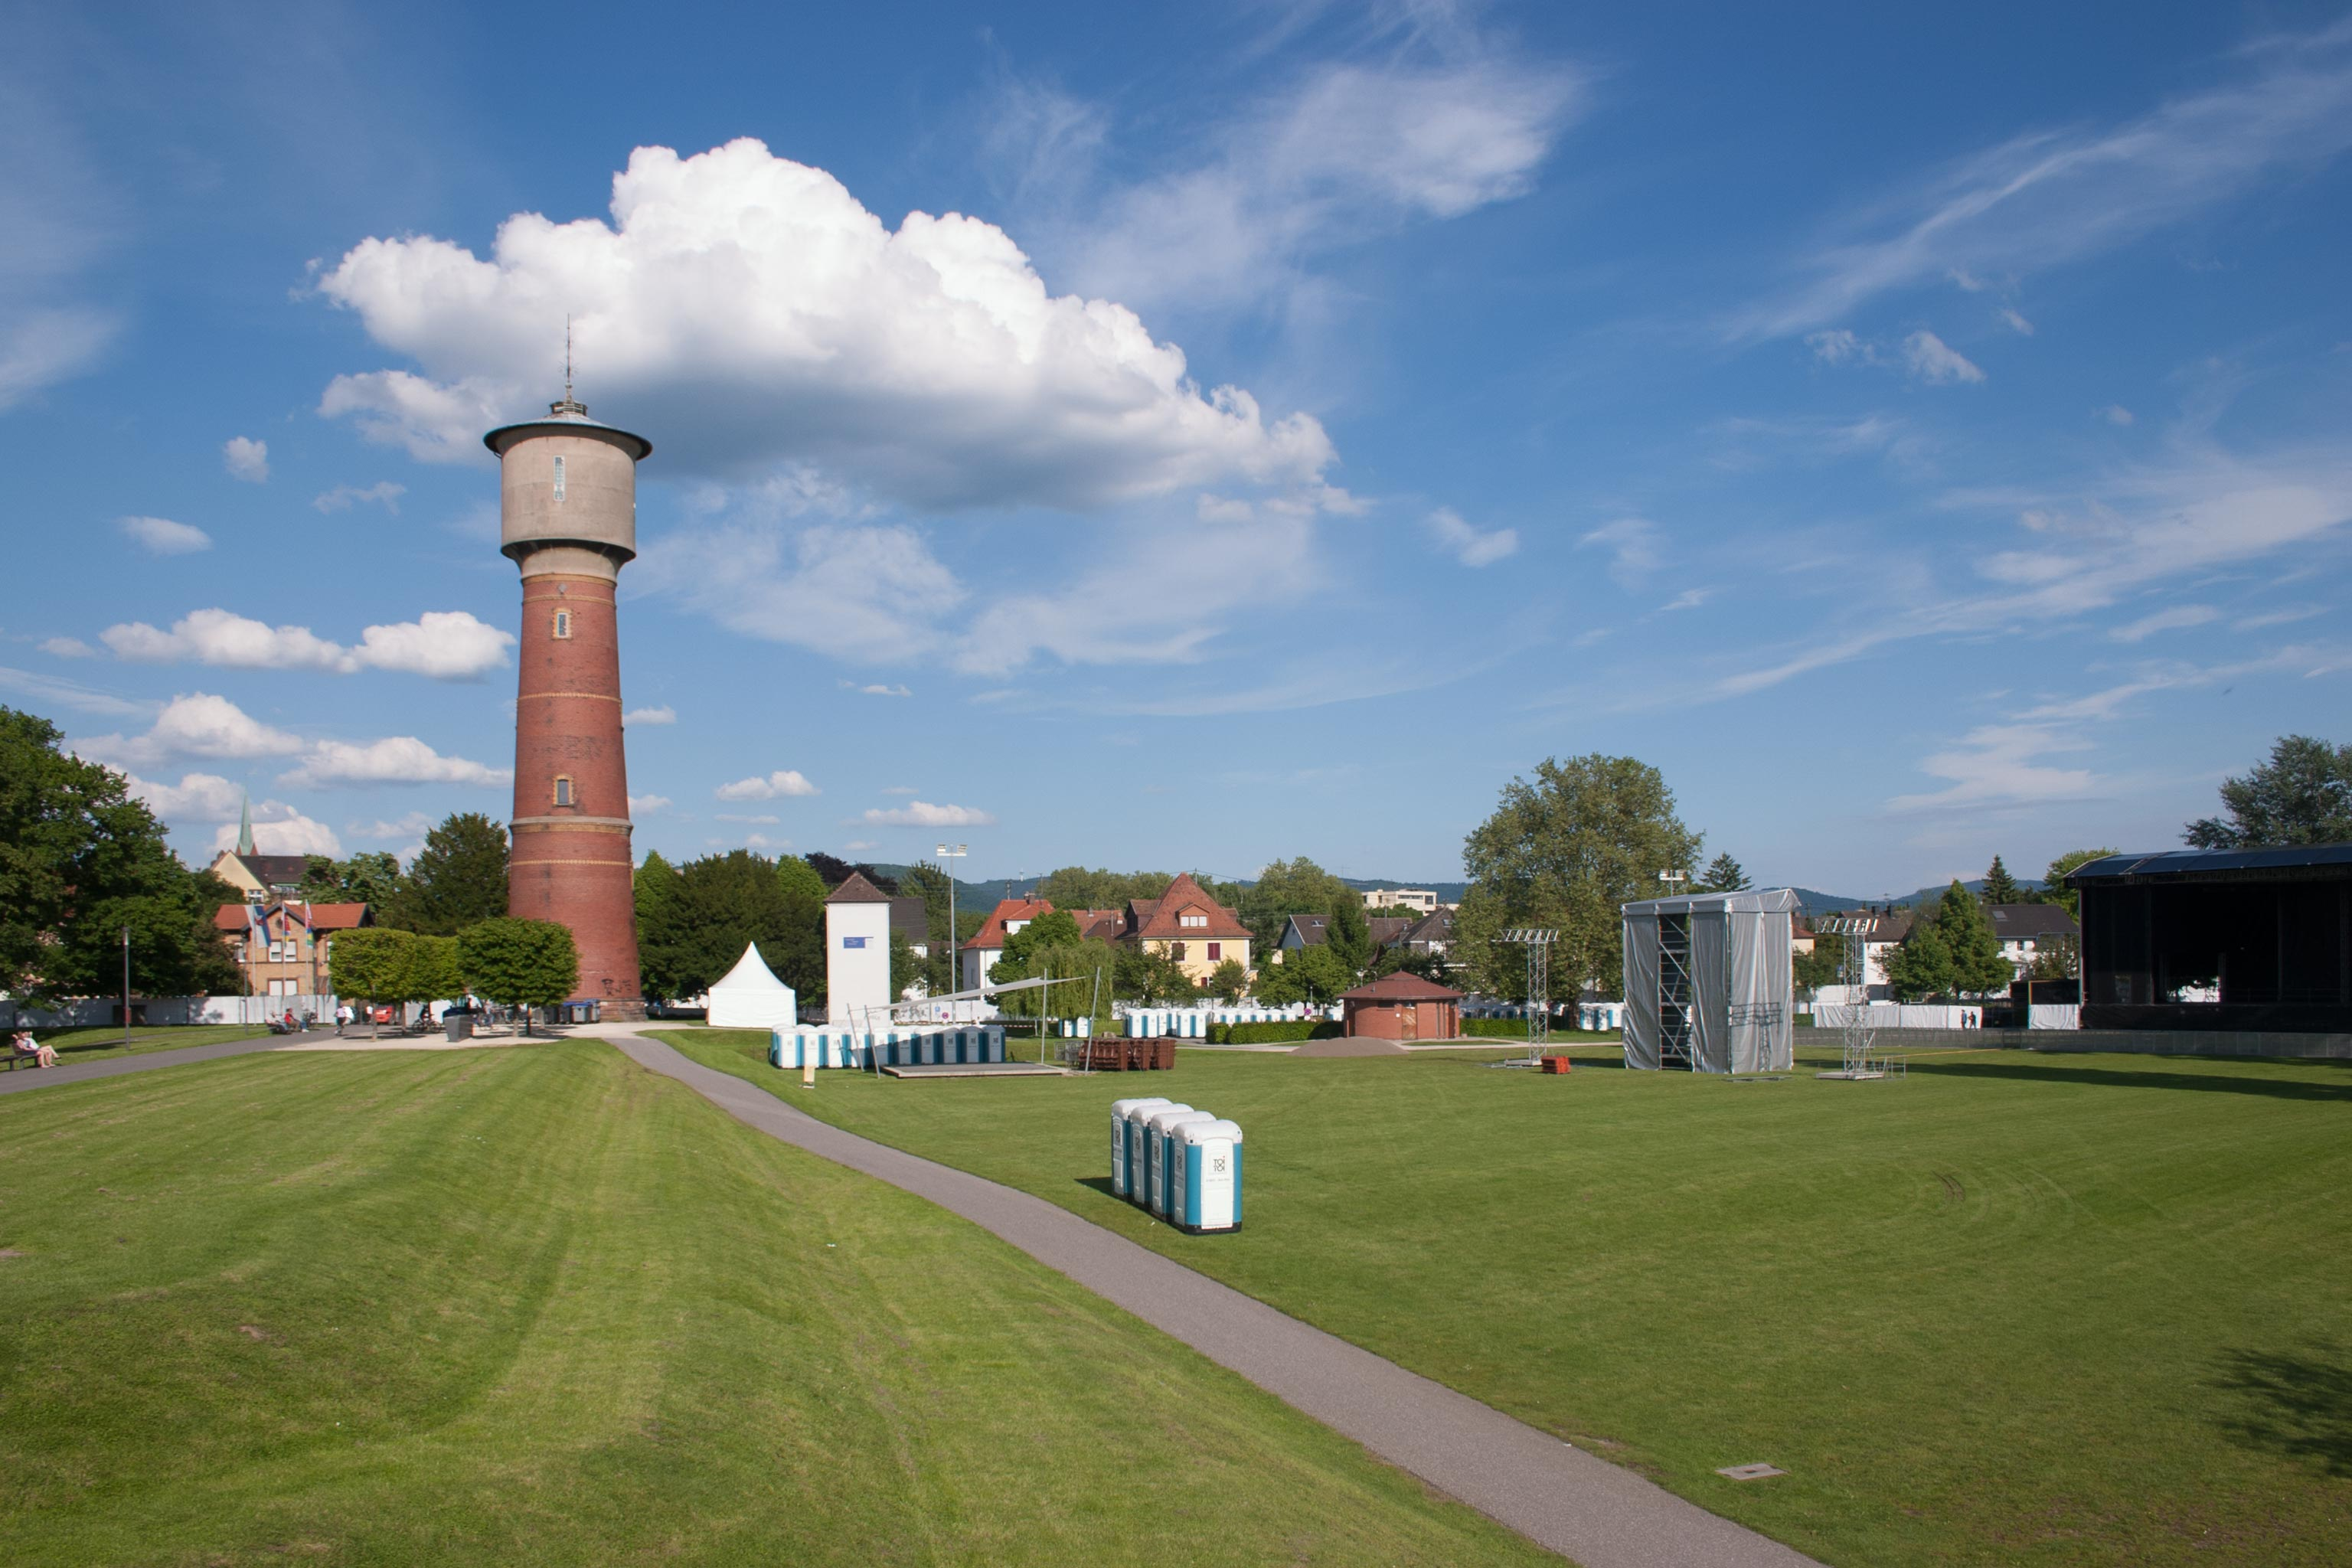 Neckar Ufer Ladenburg Wasserturm